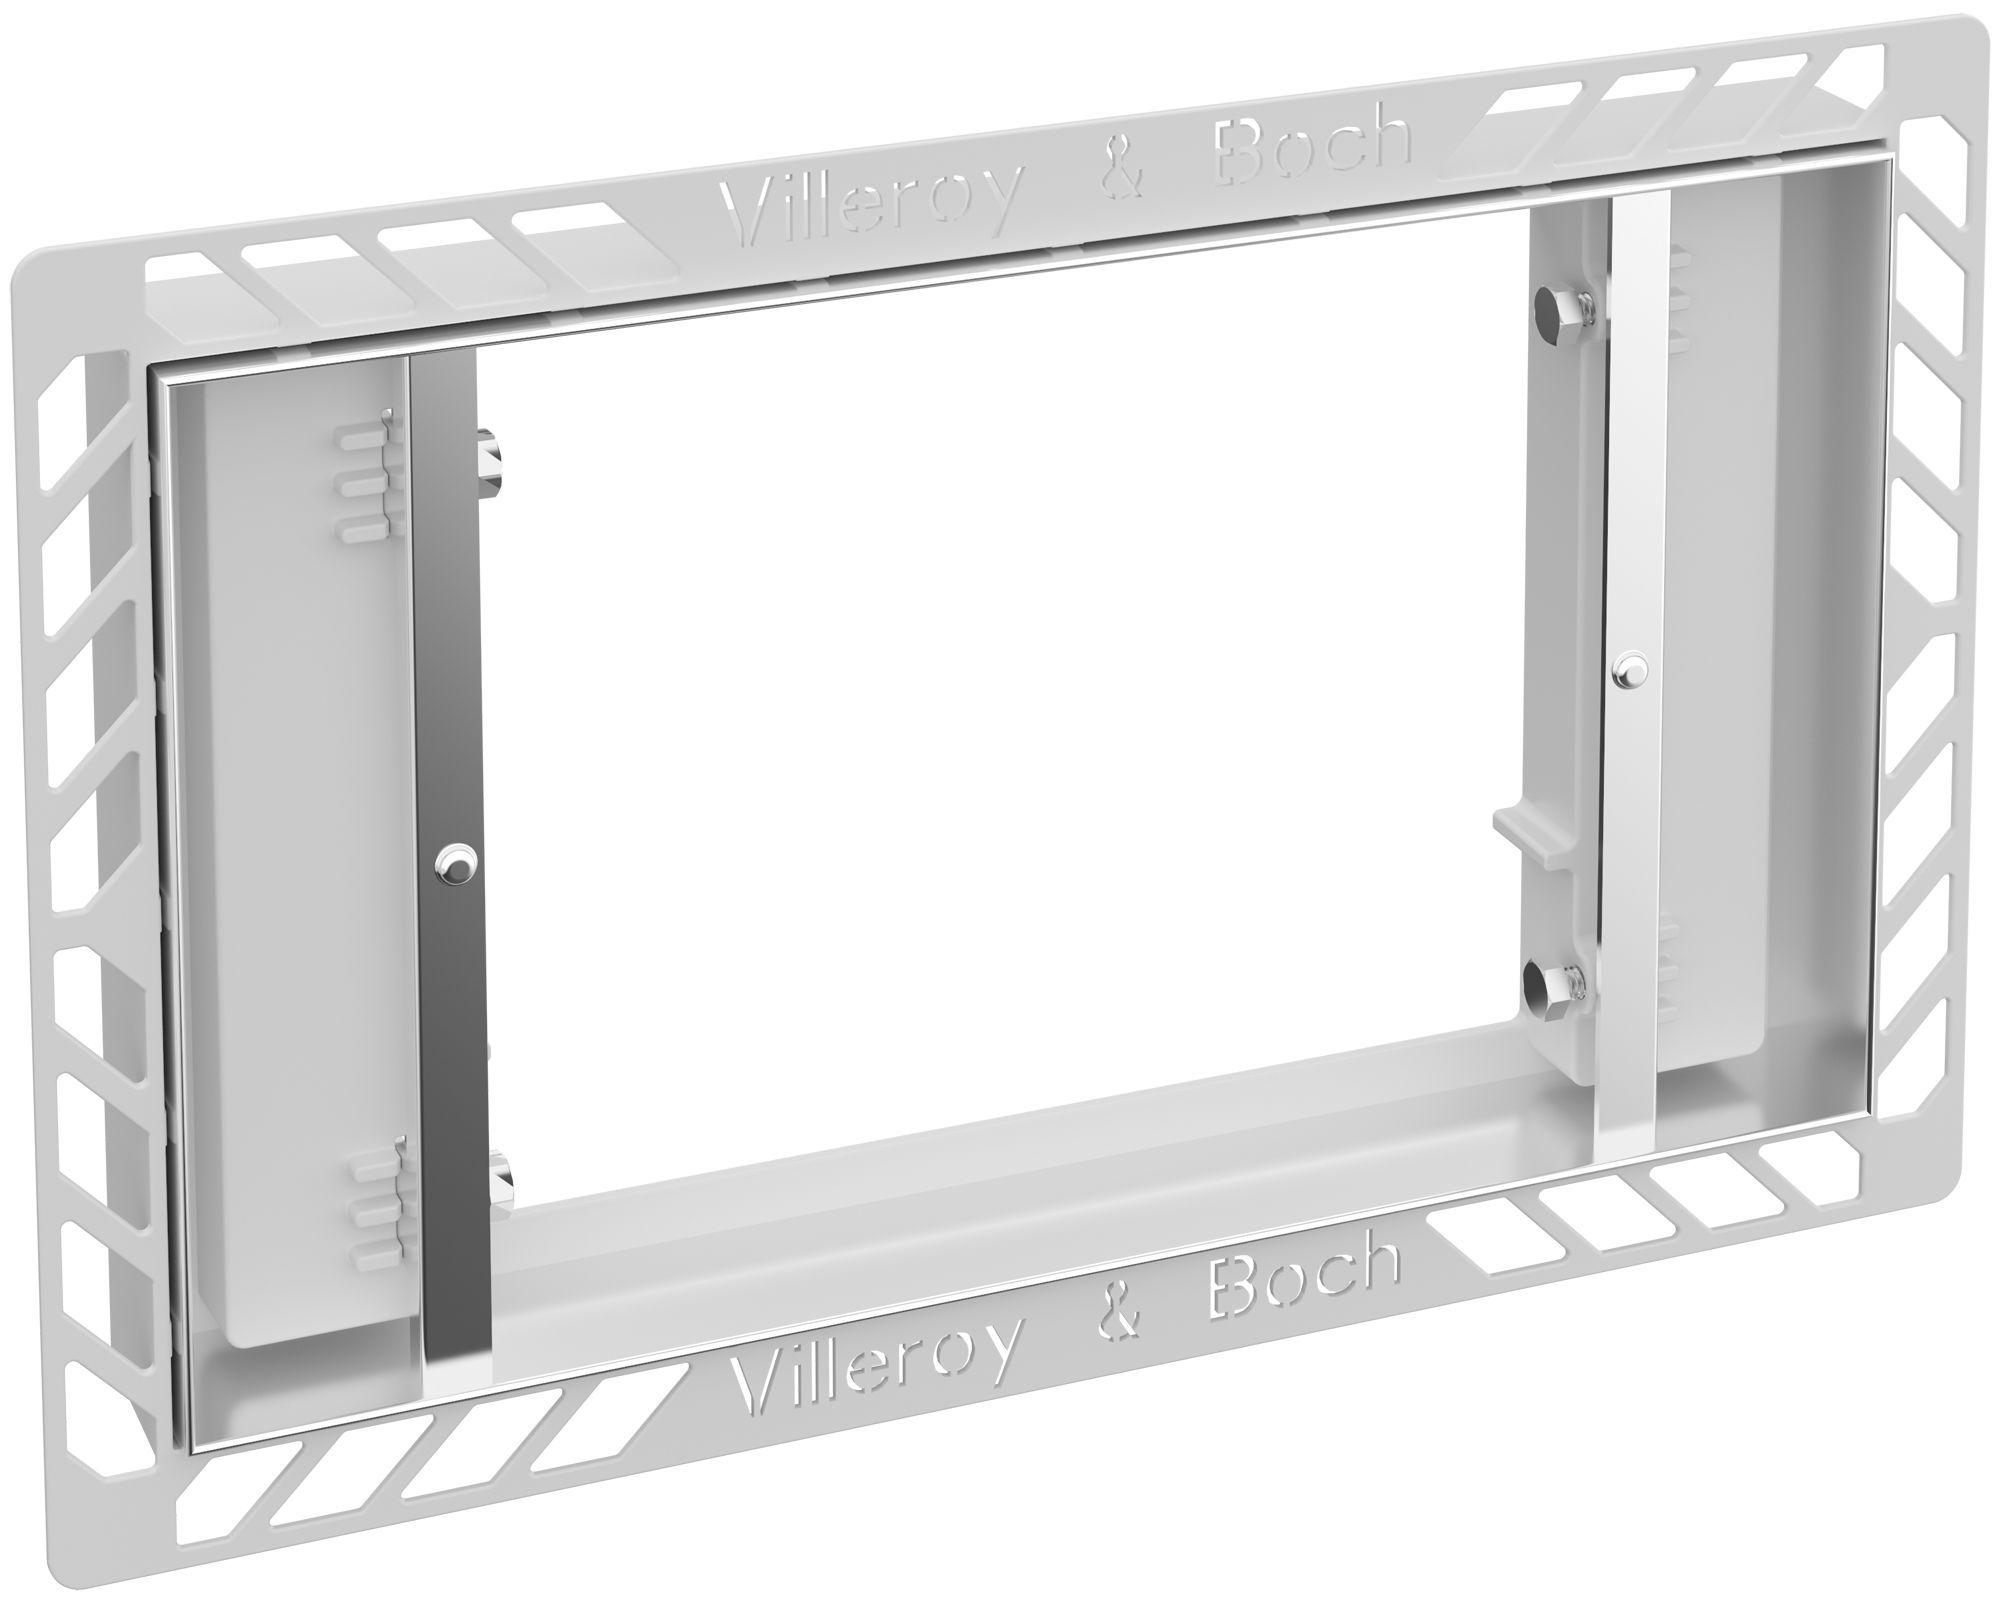 Villeroy & Boch ViConnect Einbauset flächenbündig B:29,5xT:18,6cm Edelstahl 922159LC